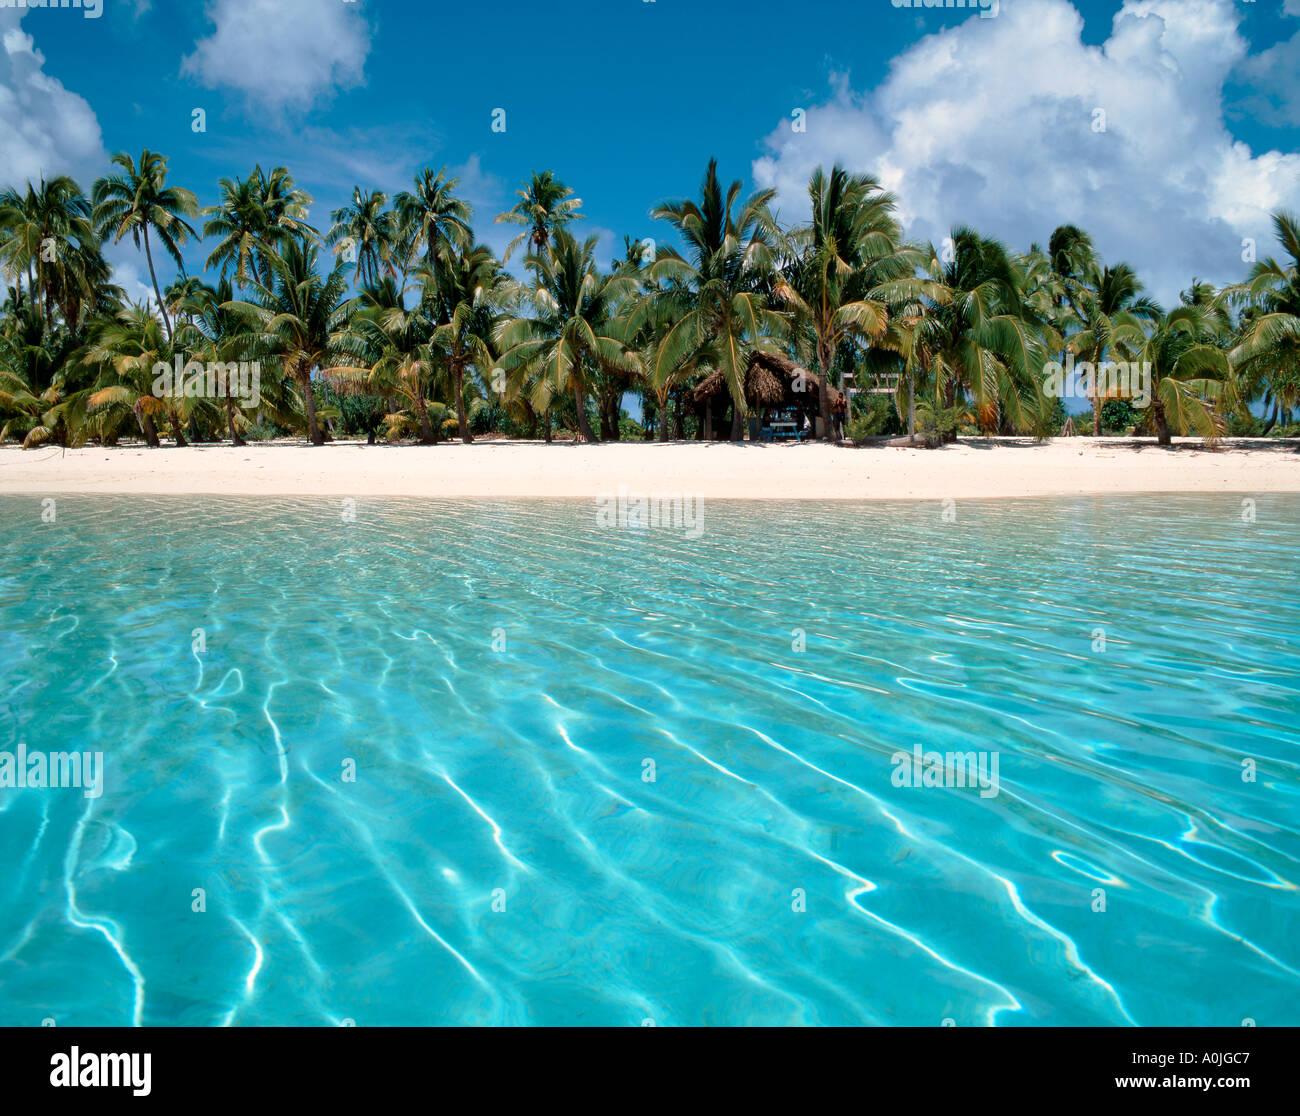 Cook Islands Beaches: South Pacific Cook Islands Aitutaki Lagoon One Foot Island